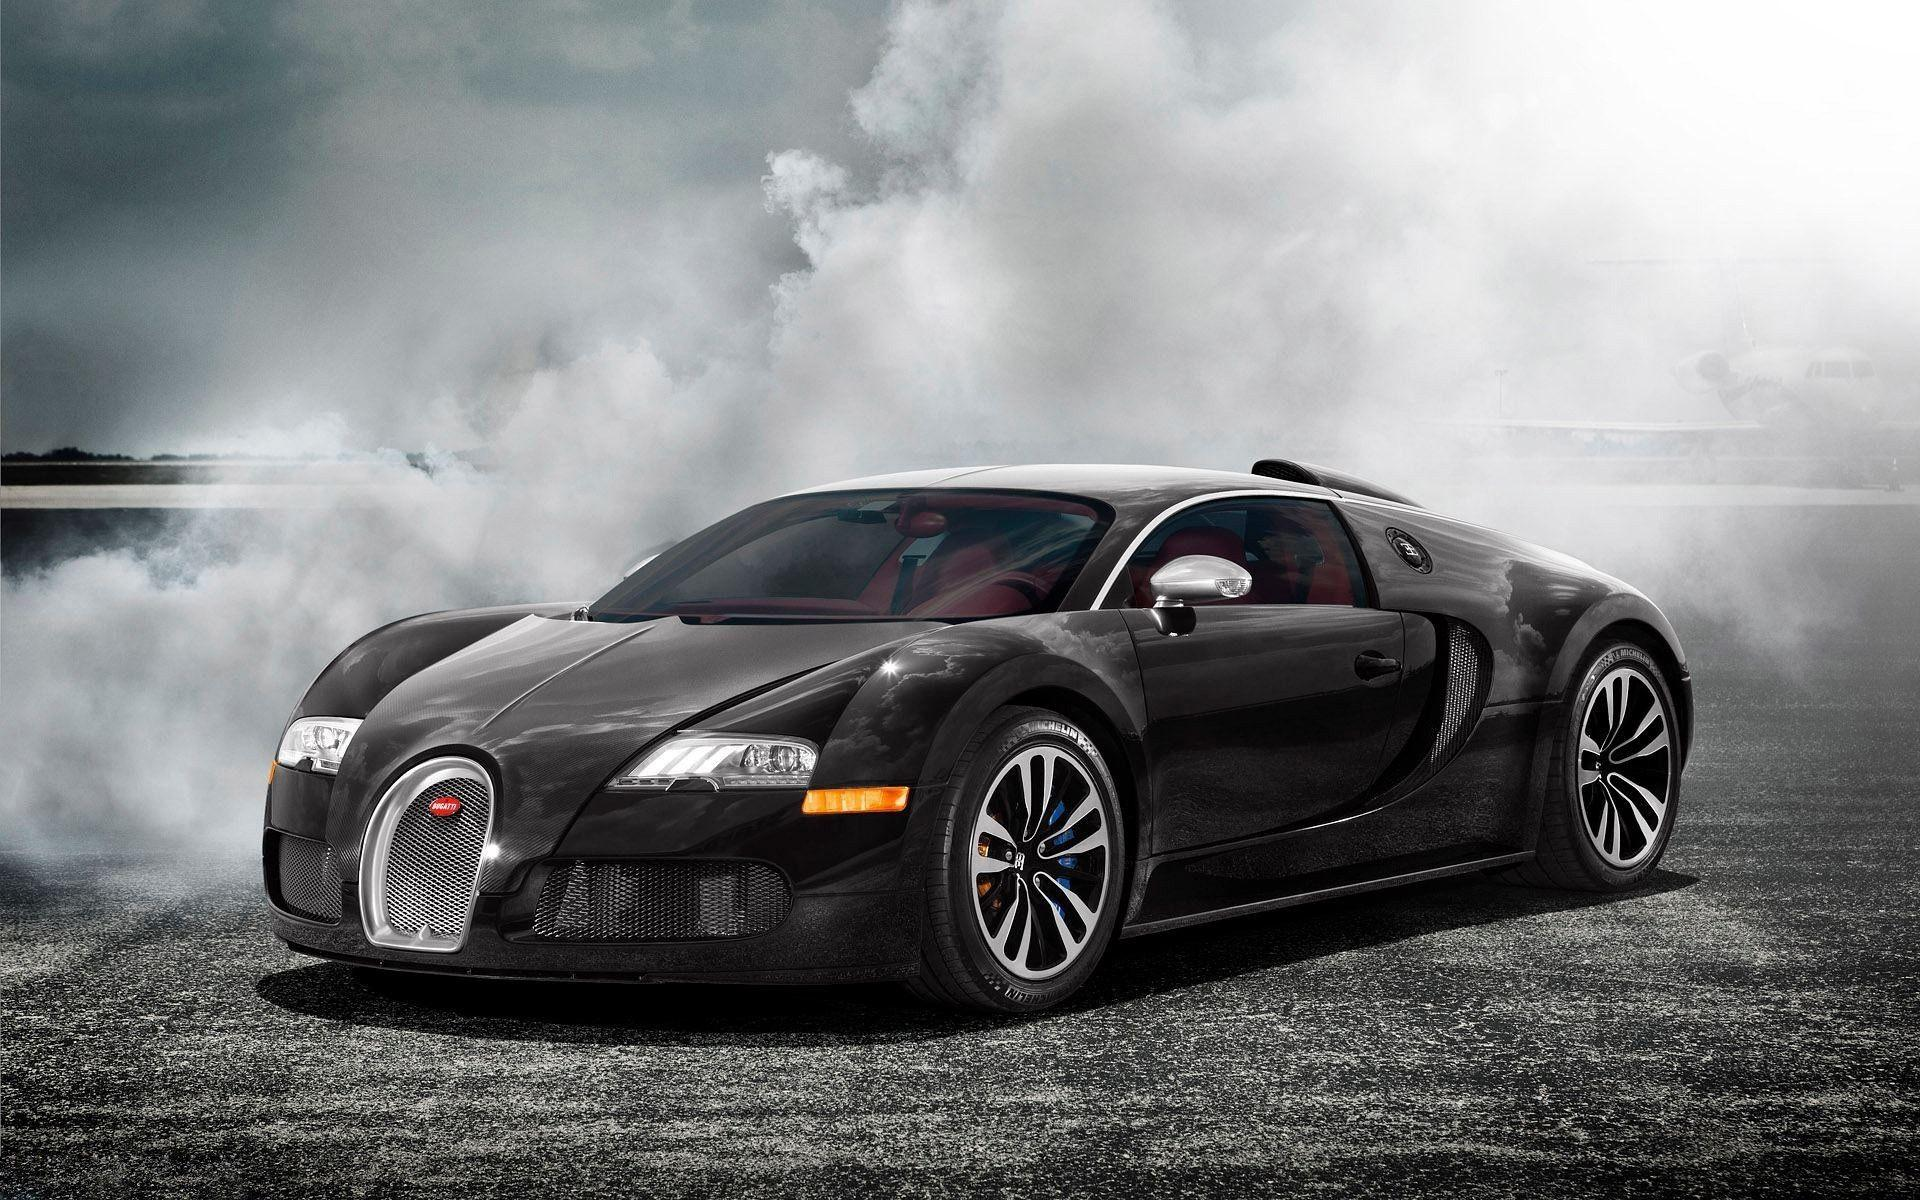 Bugatti Hd Desktop Wallpapers Wallpaper Cave